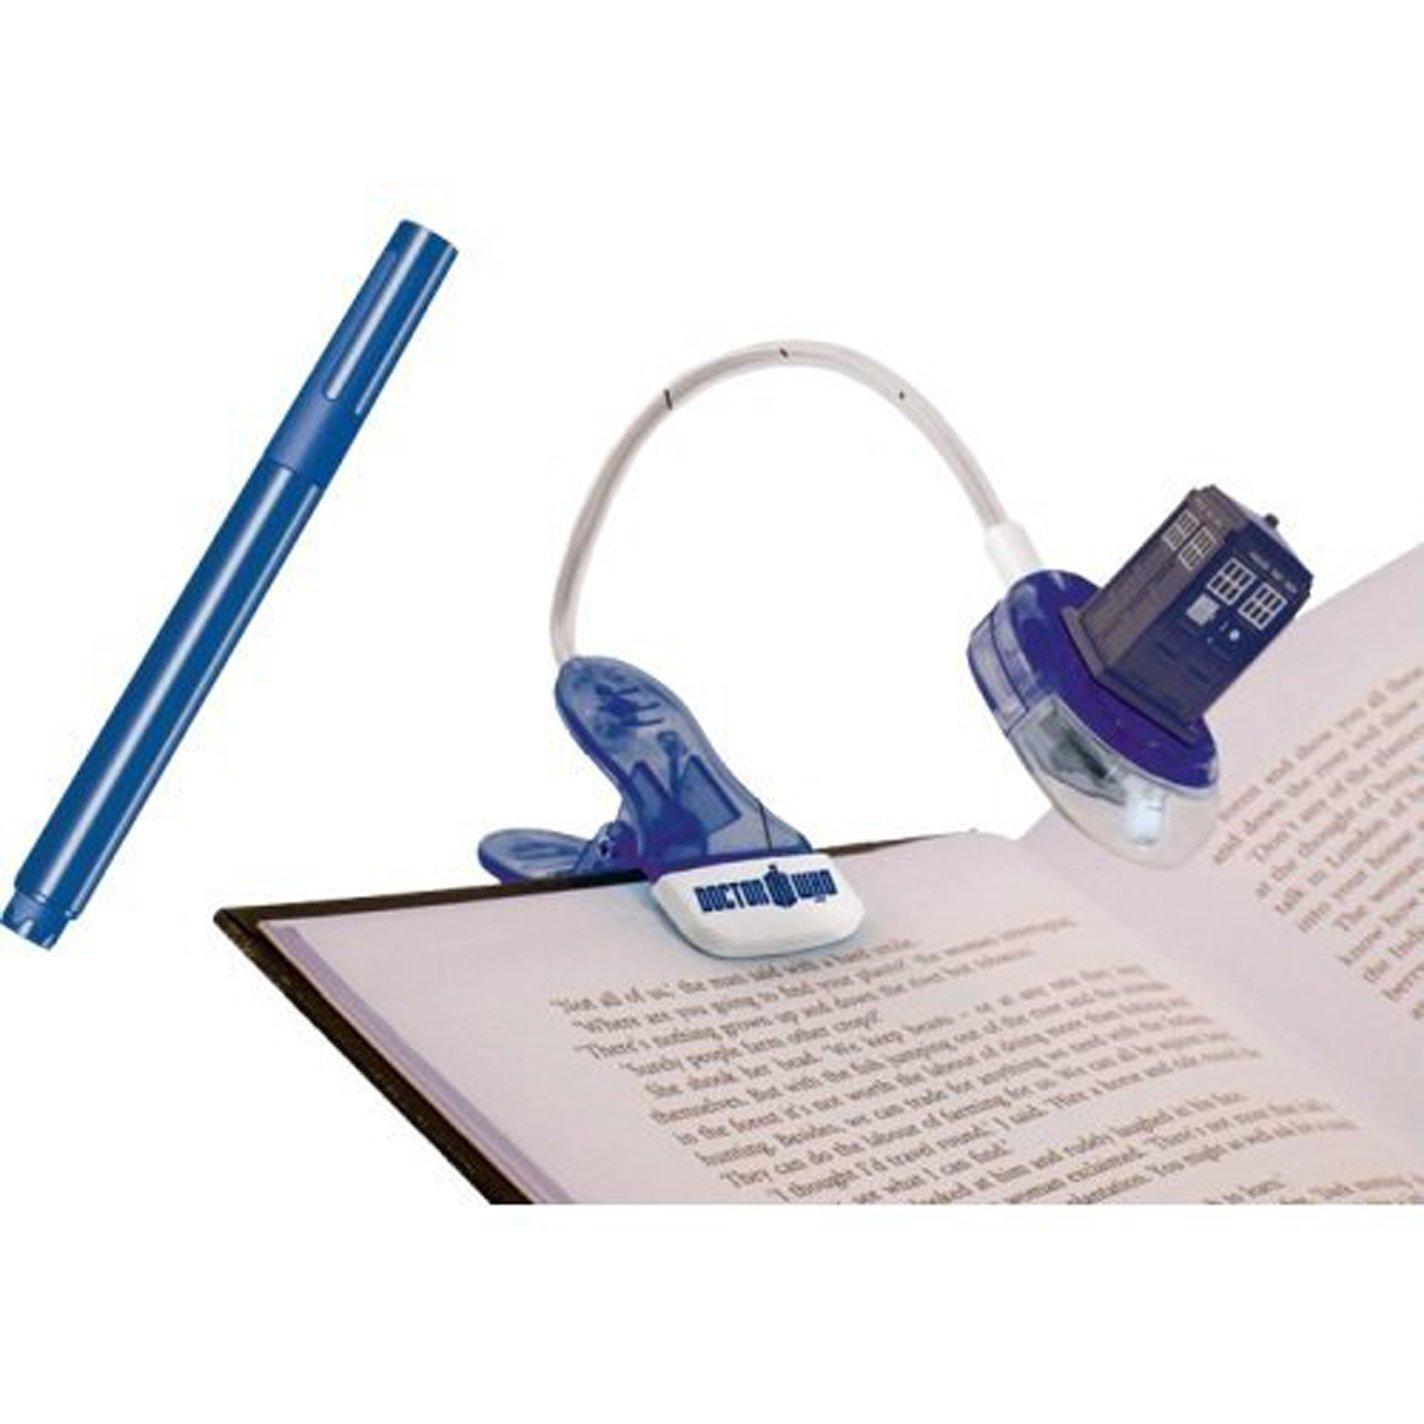 https://www.amazon.ca/Underground-Toys-DR146-Doctor-Booklight/dp/B007WHWMXW/ref=sr_1_1?s=kitchen&ie=UTF8&qid=1544214544&sr=1-1&keywords=Dr.+Who+book+light